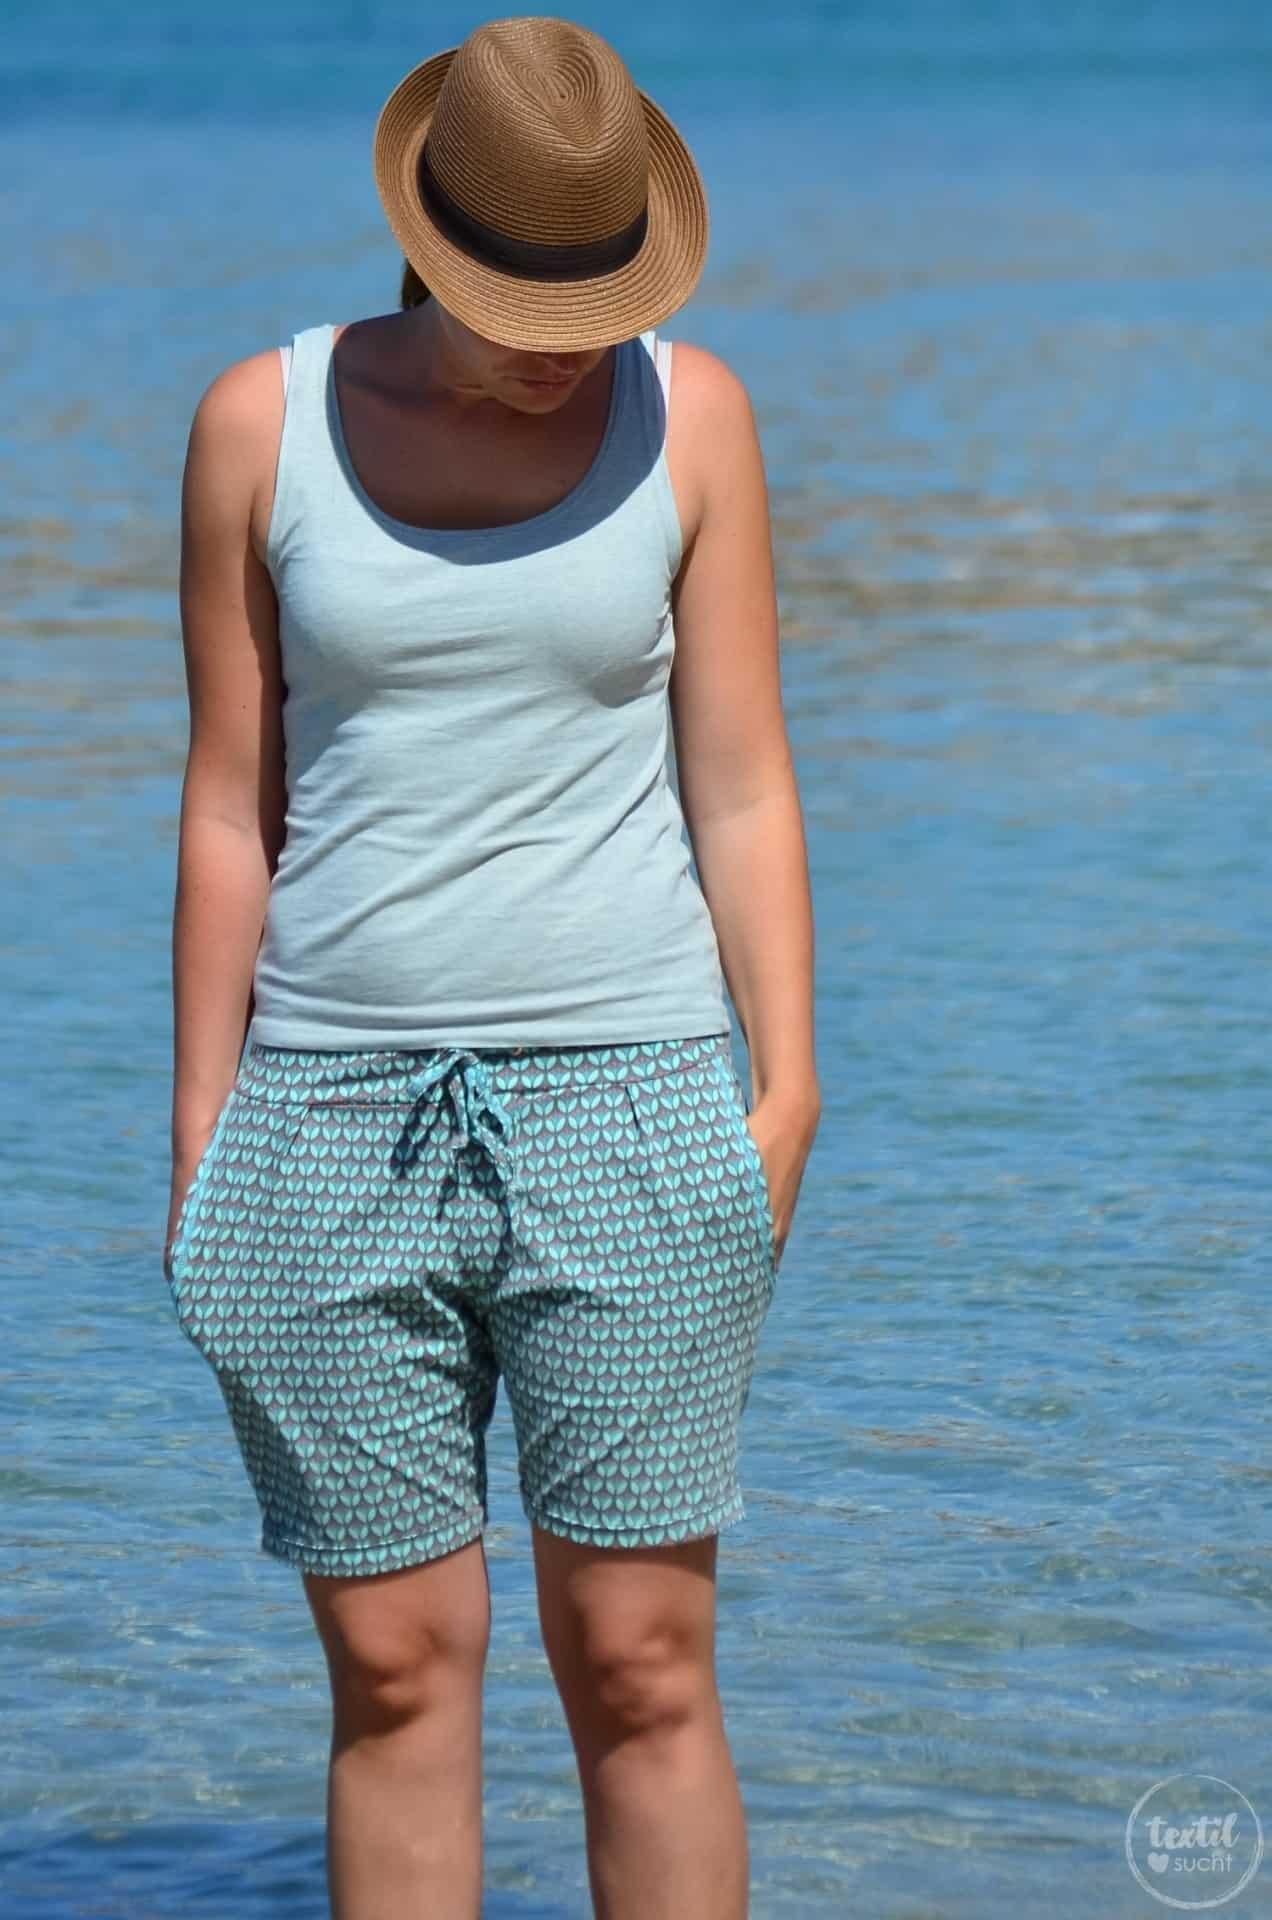 Nähen für den Strand: Schnittmuster Velara als Shorts - Bild 9   textilsucht.de